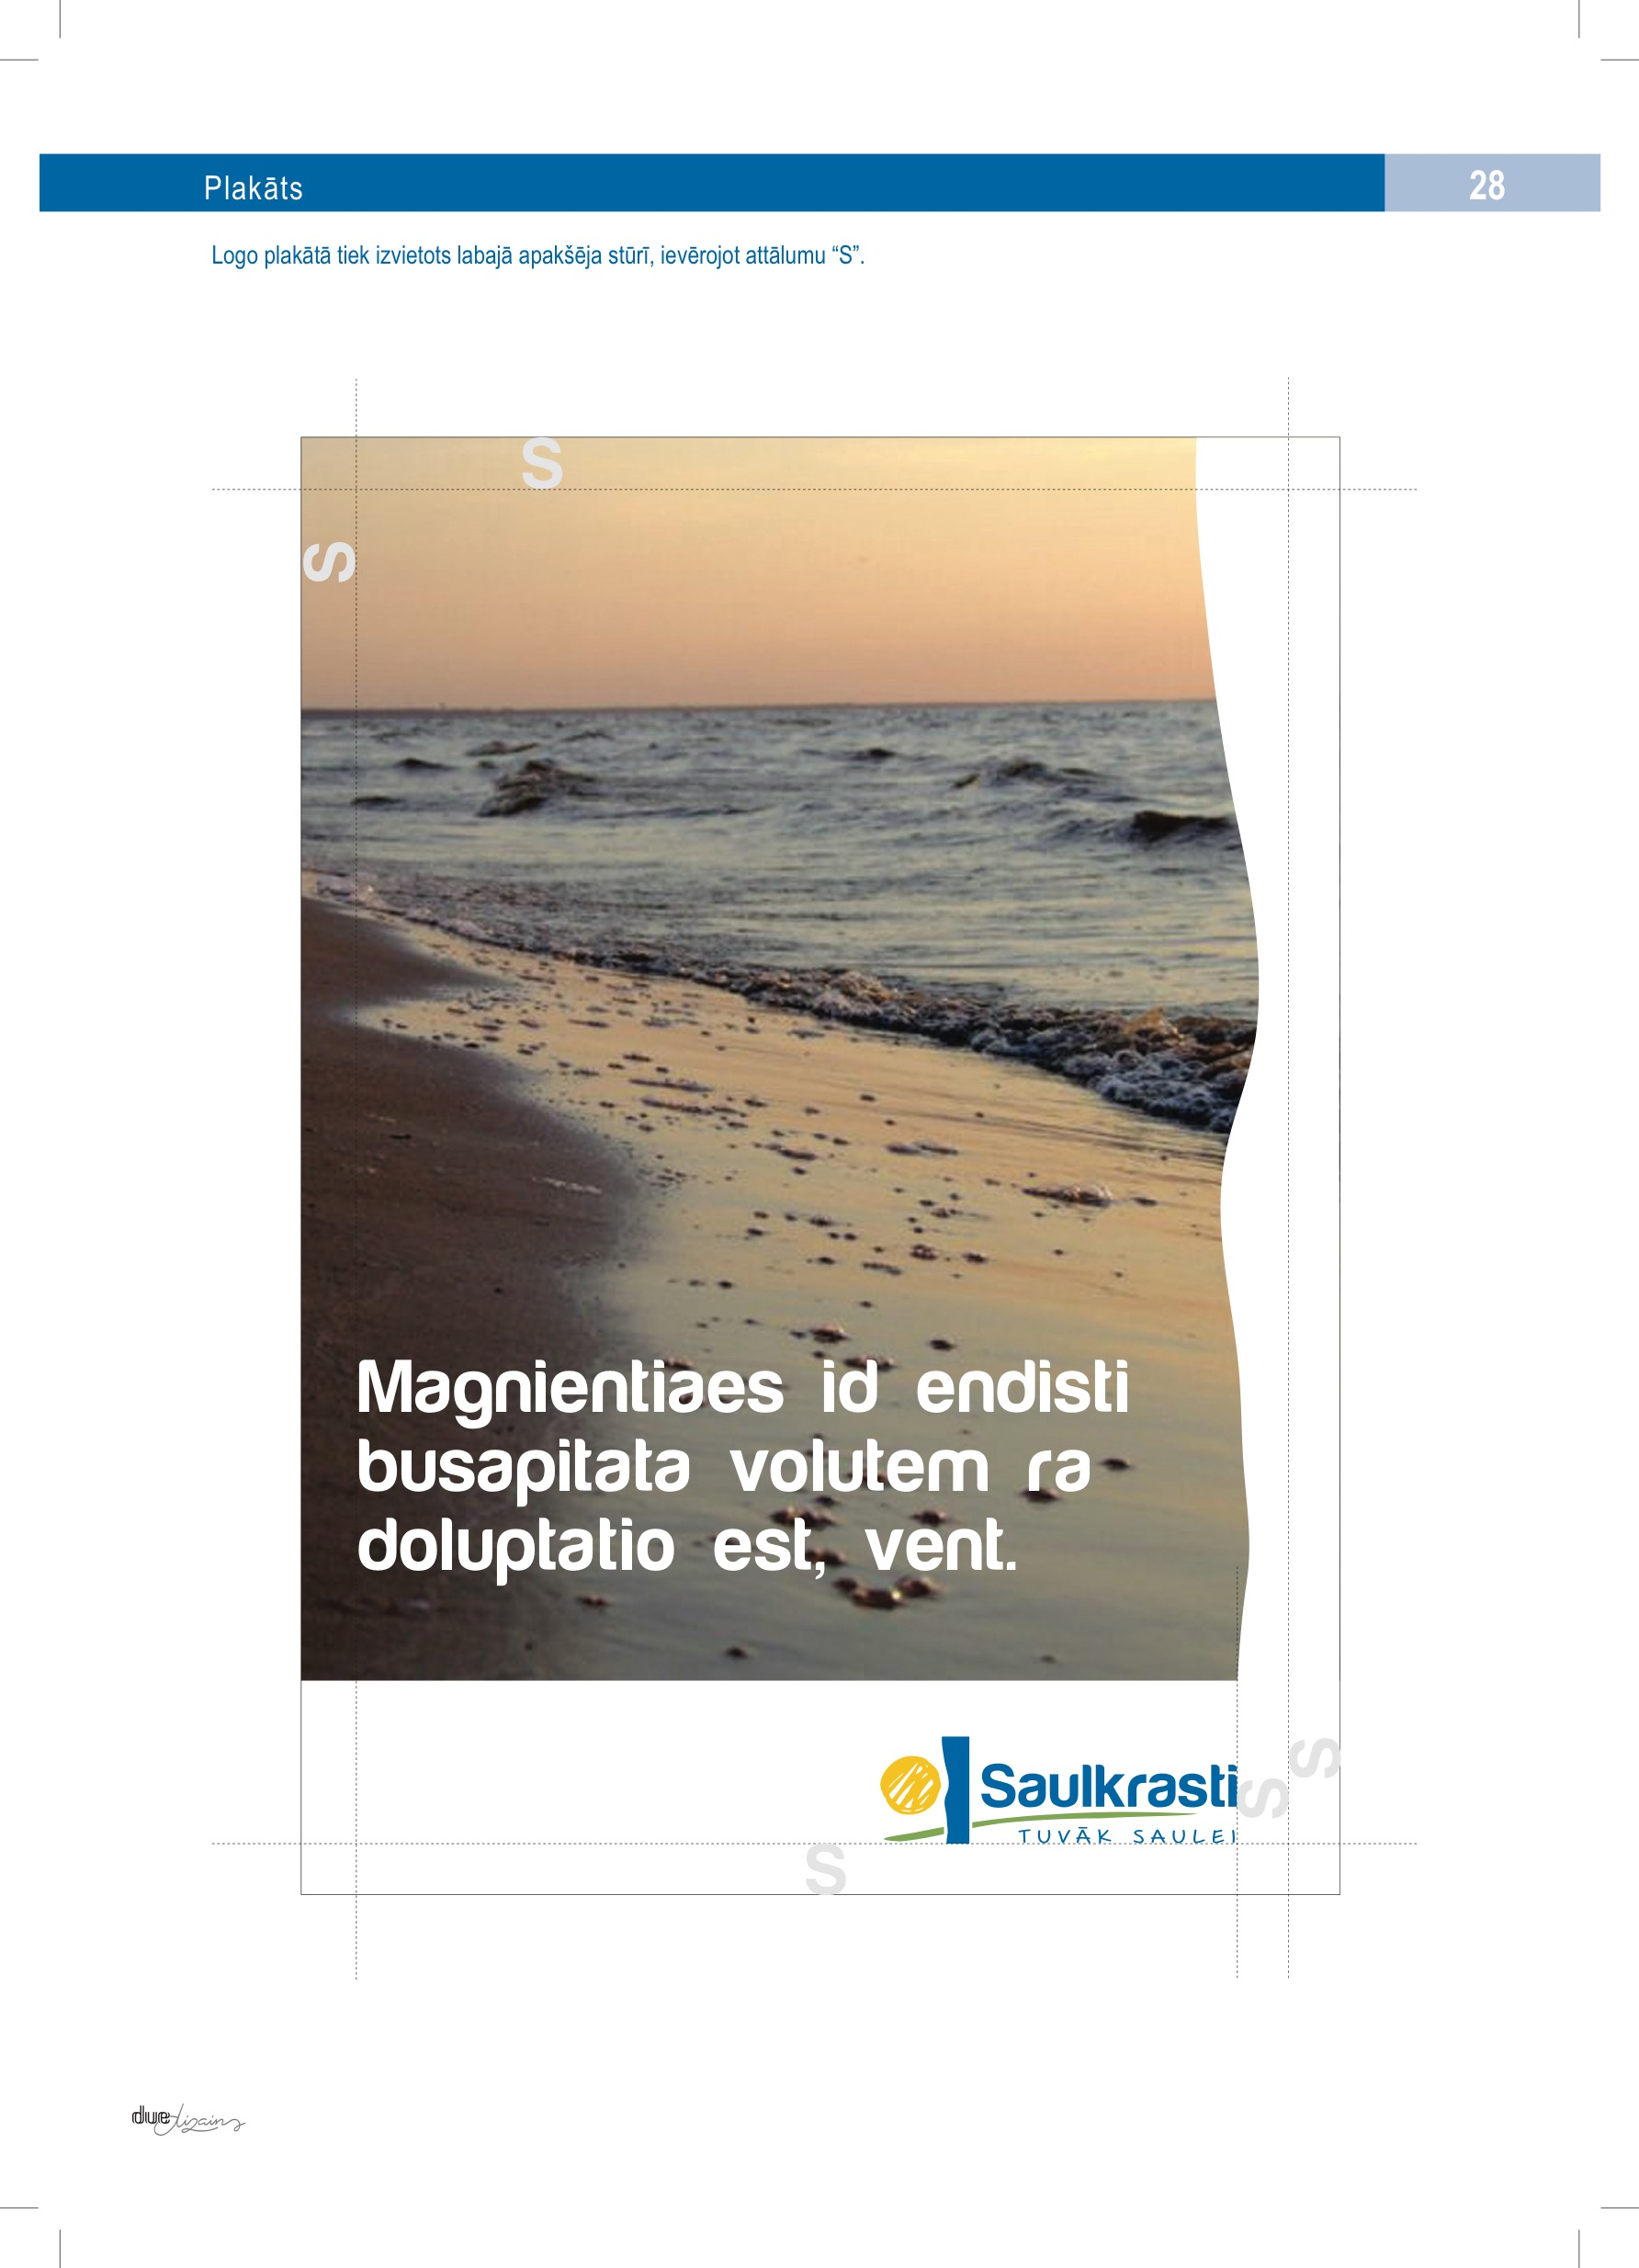 saulkrasti-print 30